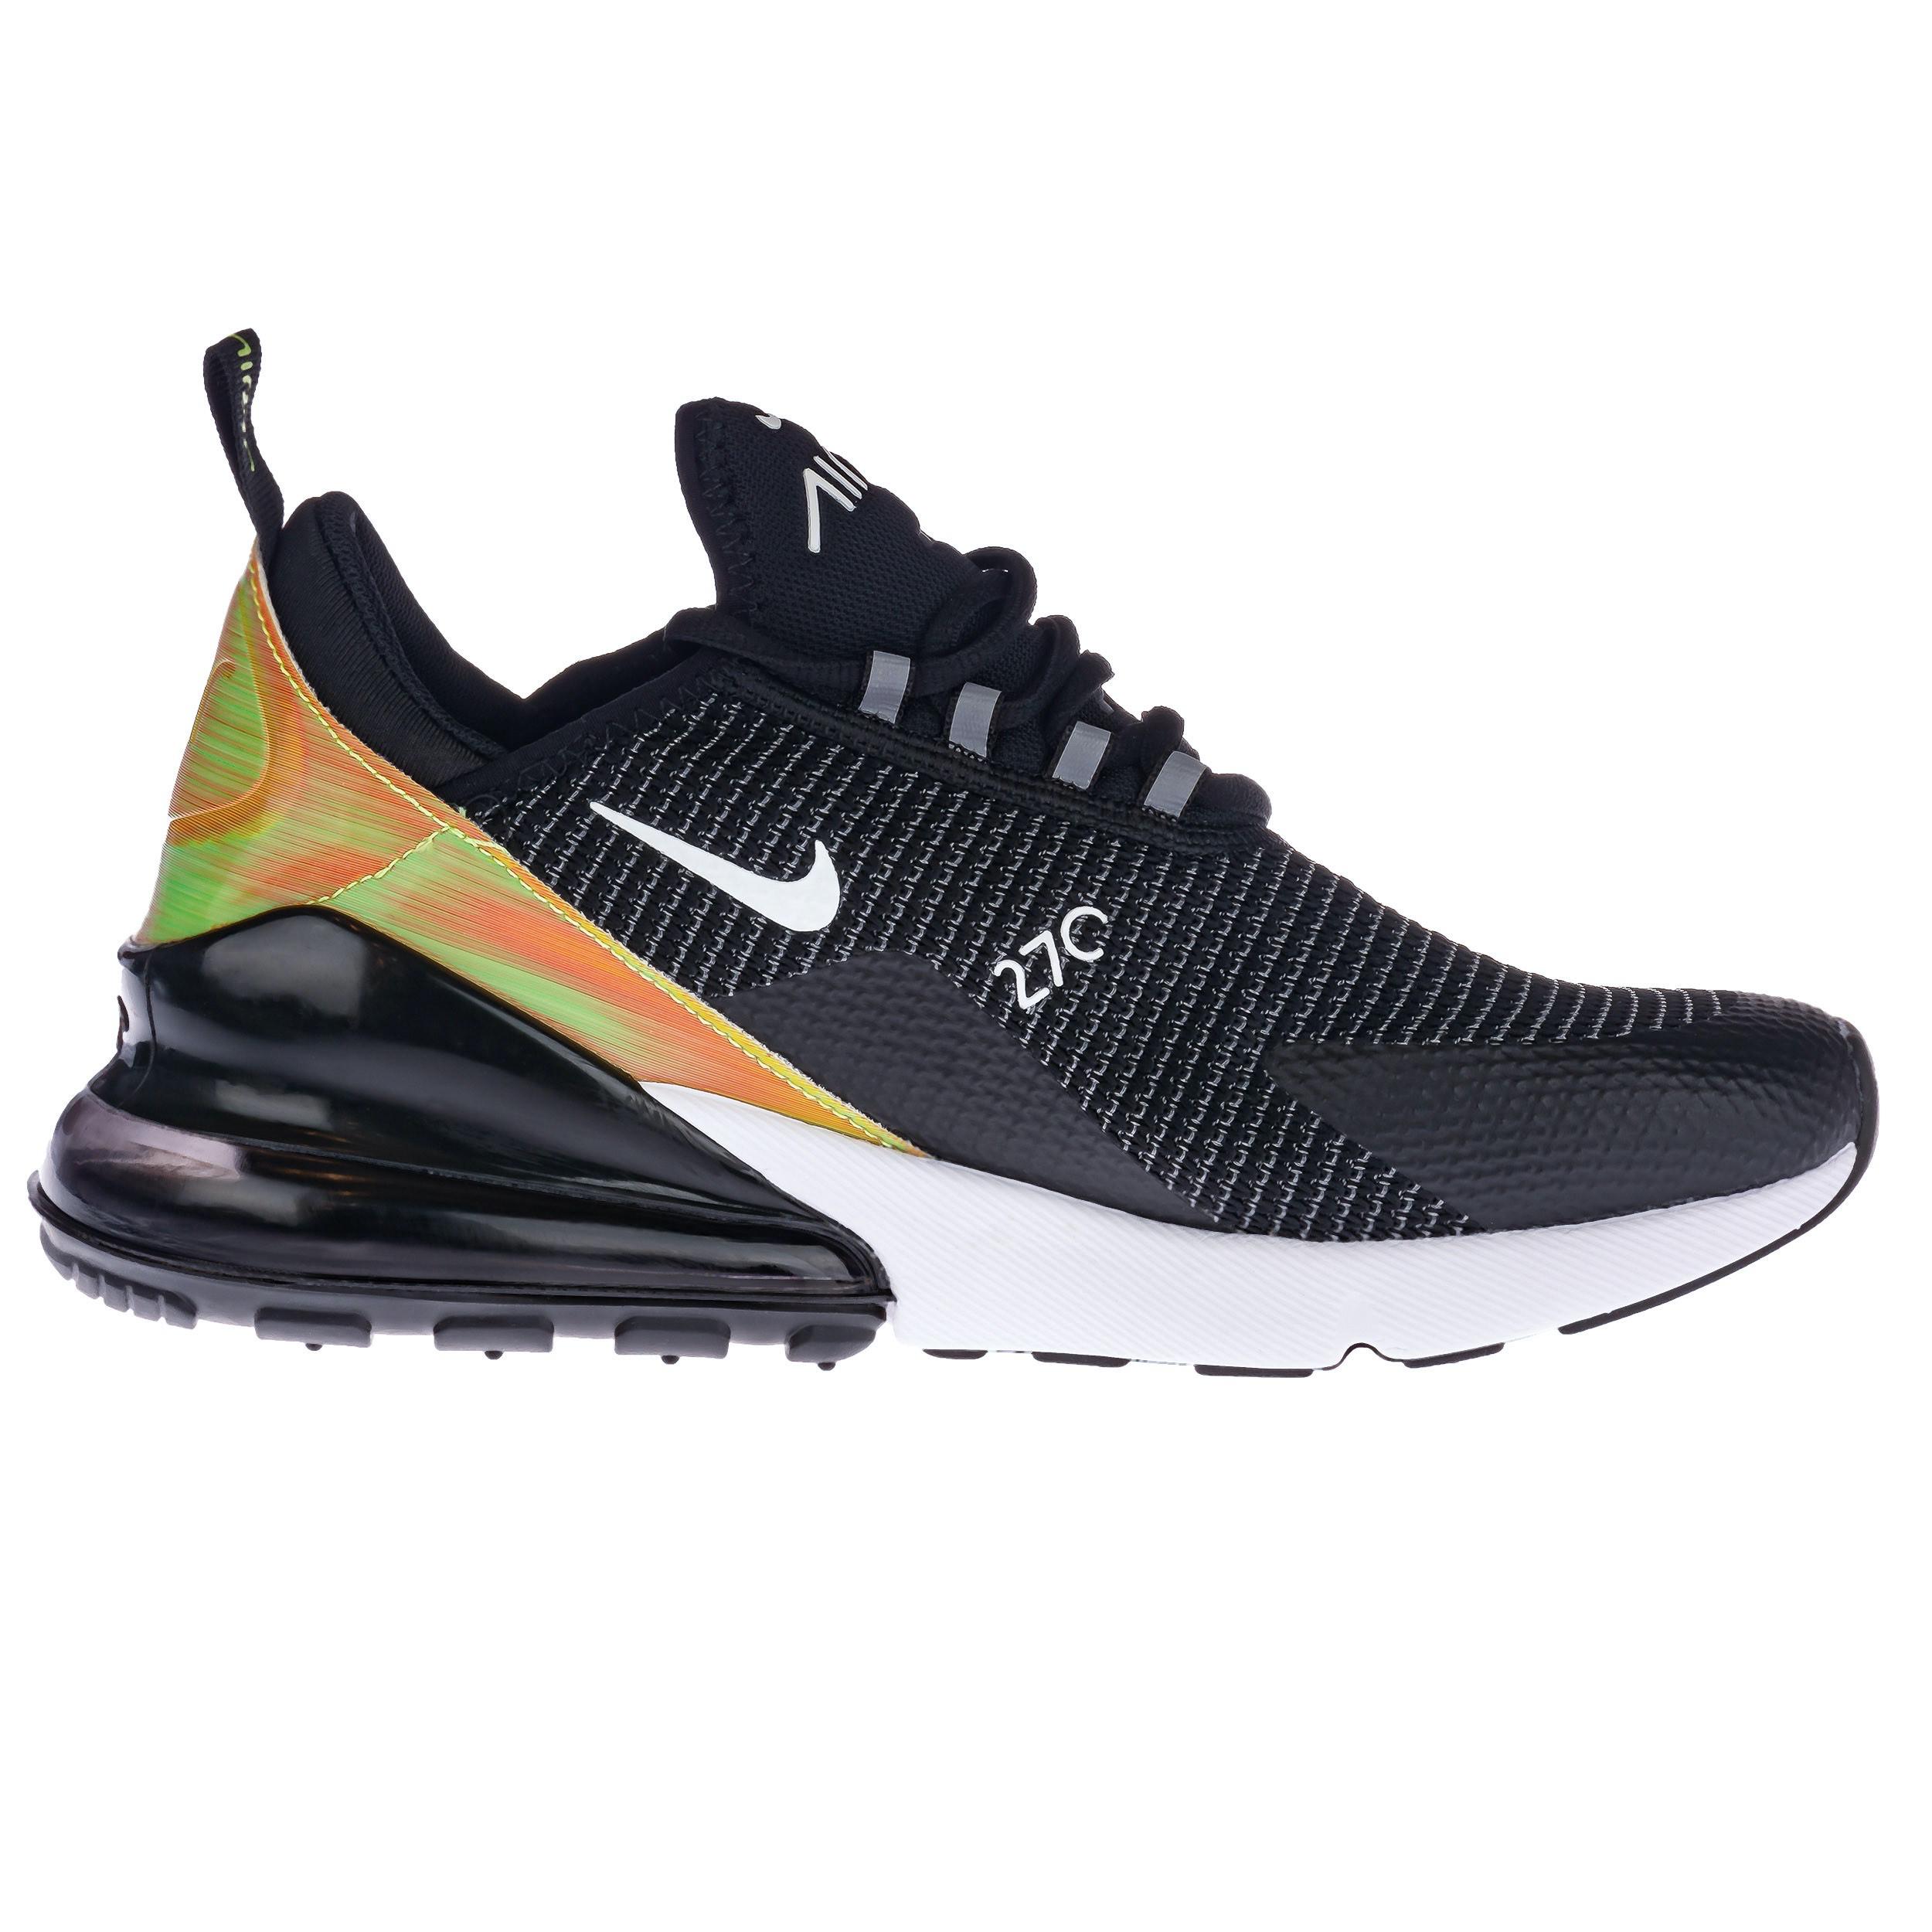 خرید                      کفش  پیاده روی مردانه کد A44